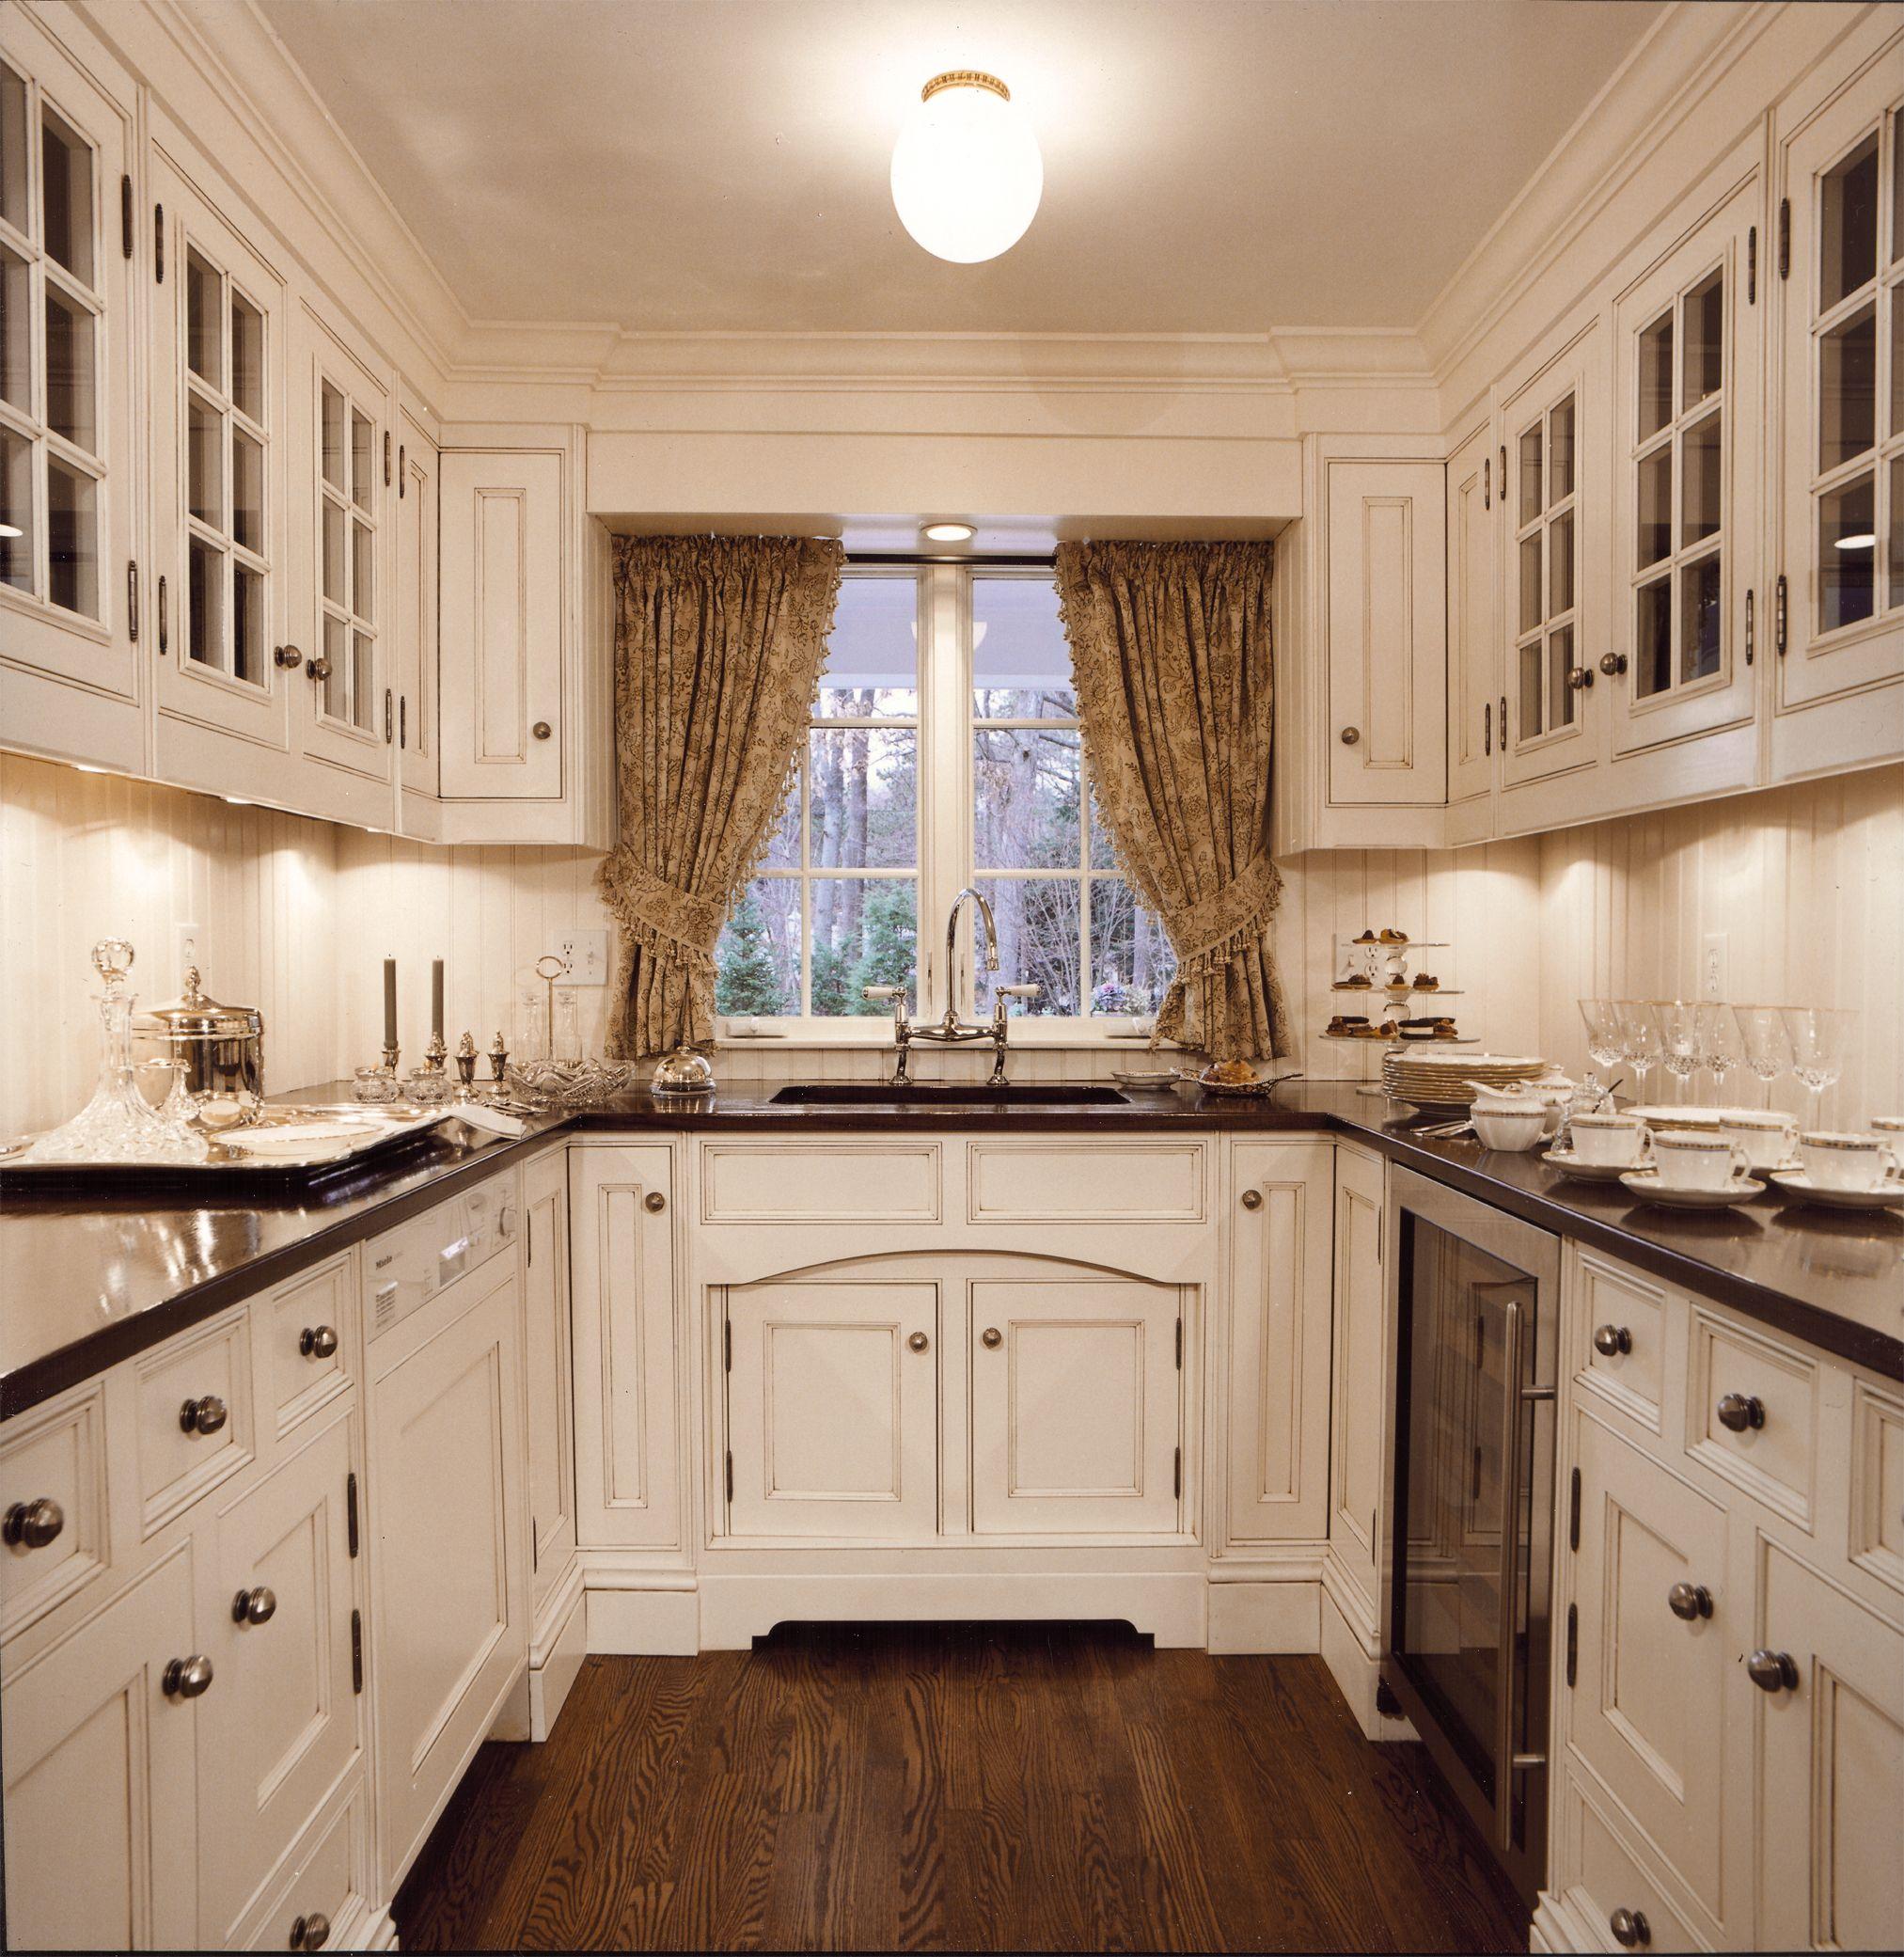 Kitchen Benson Interiors Boston Ma Www Bensoninteriors Com Home Depot Kitchen Kitchen Cabinets Kitchen Cabinet Hardware